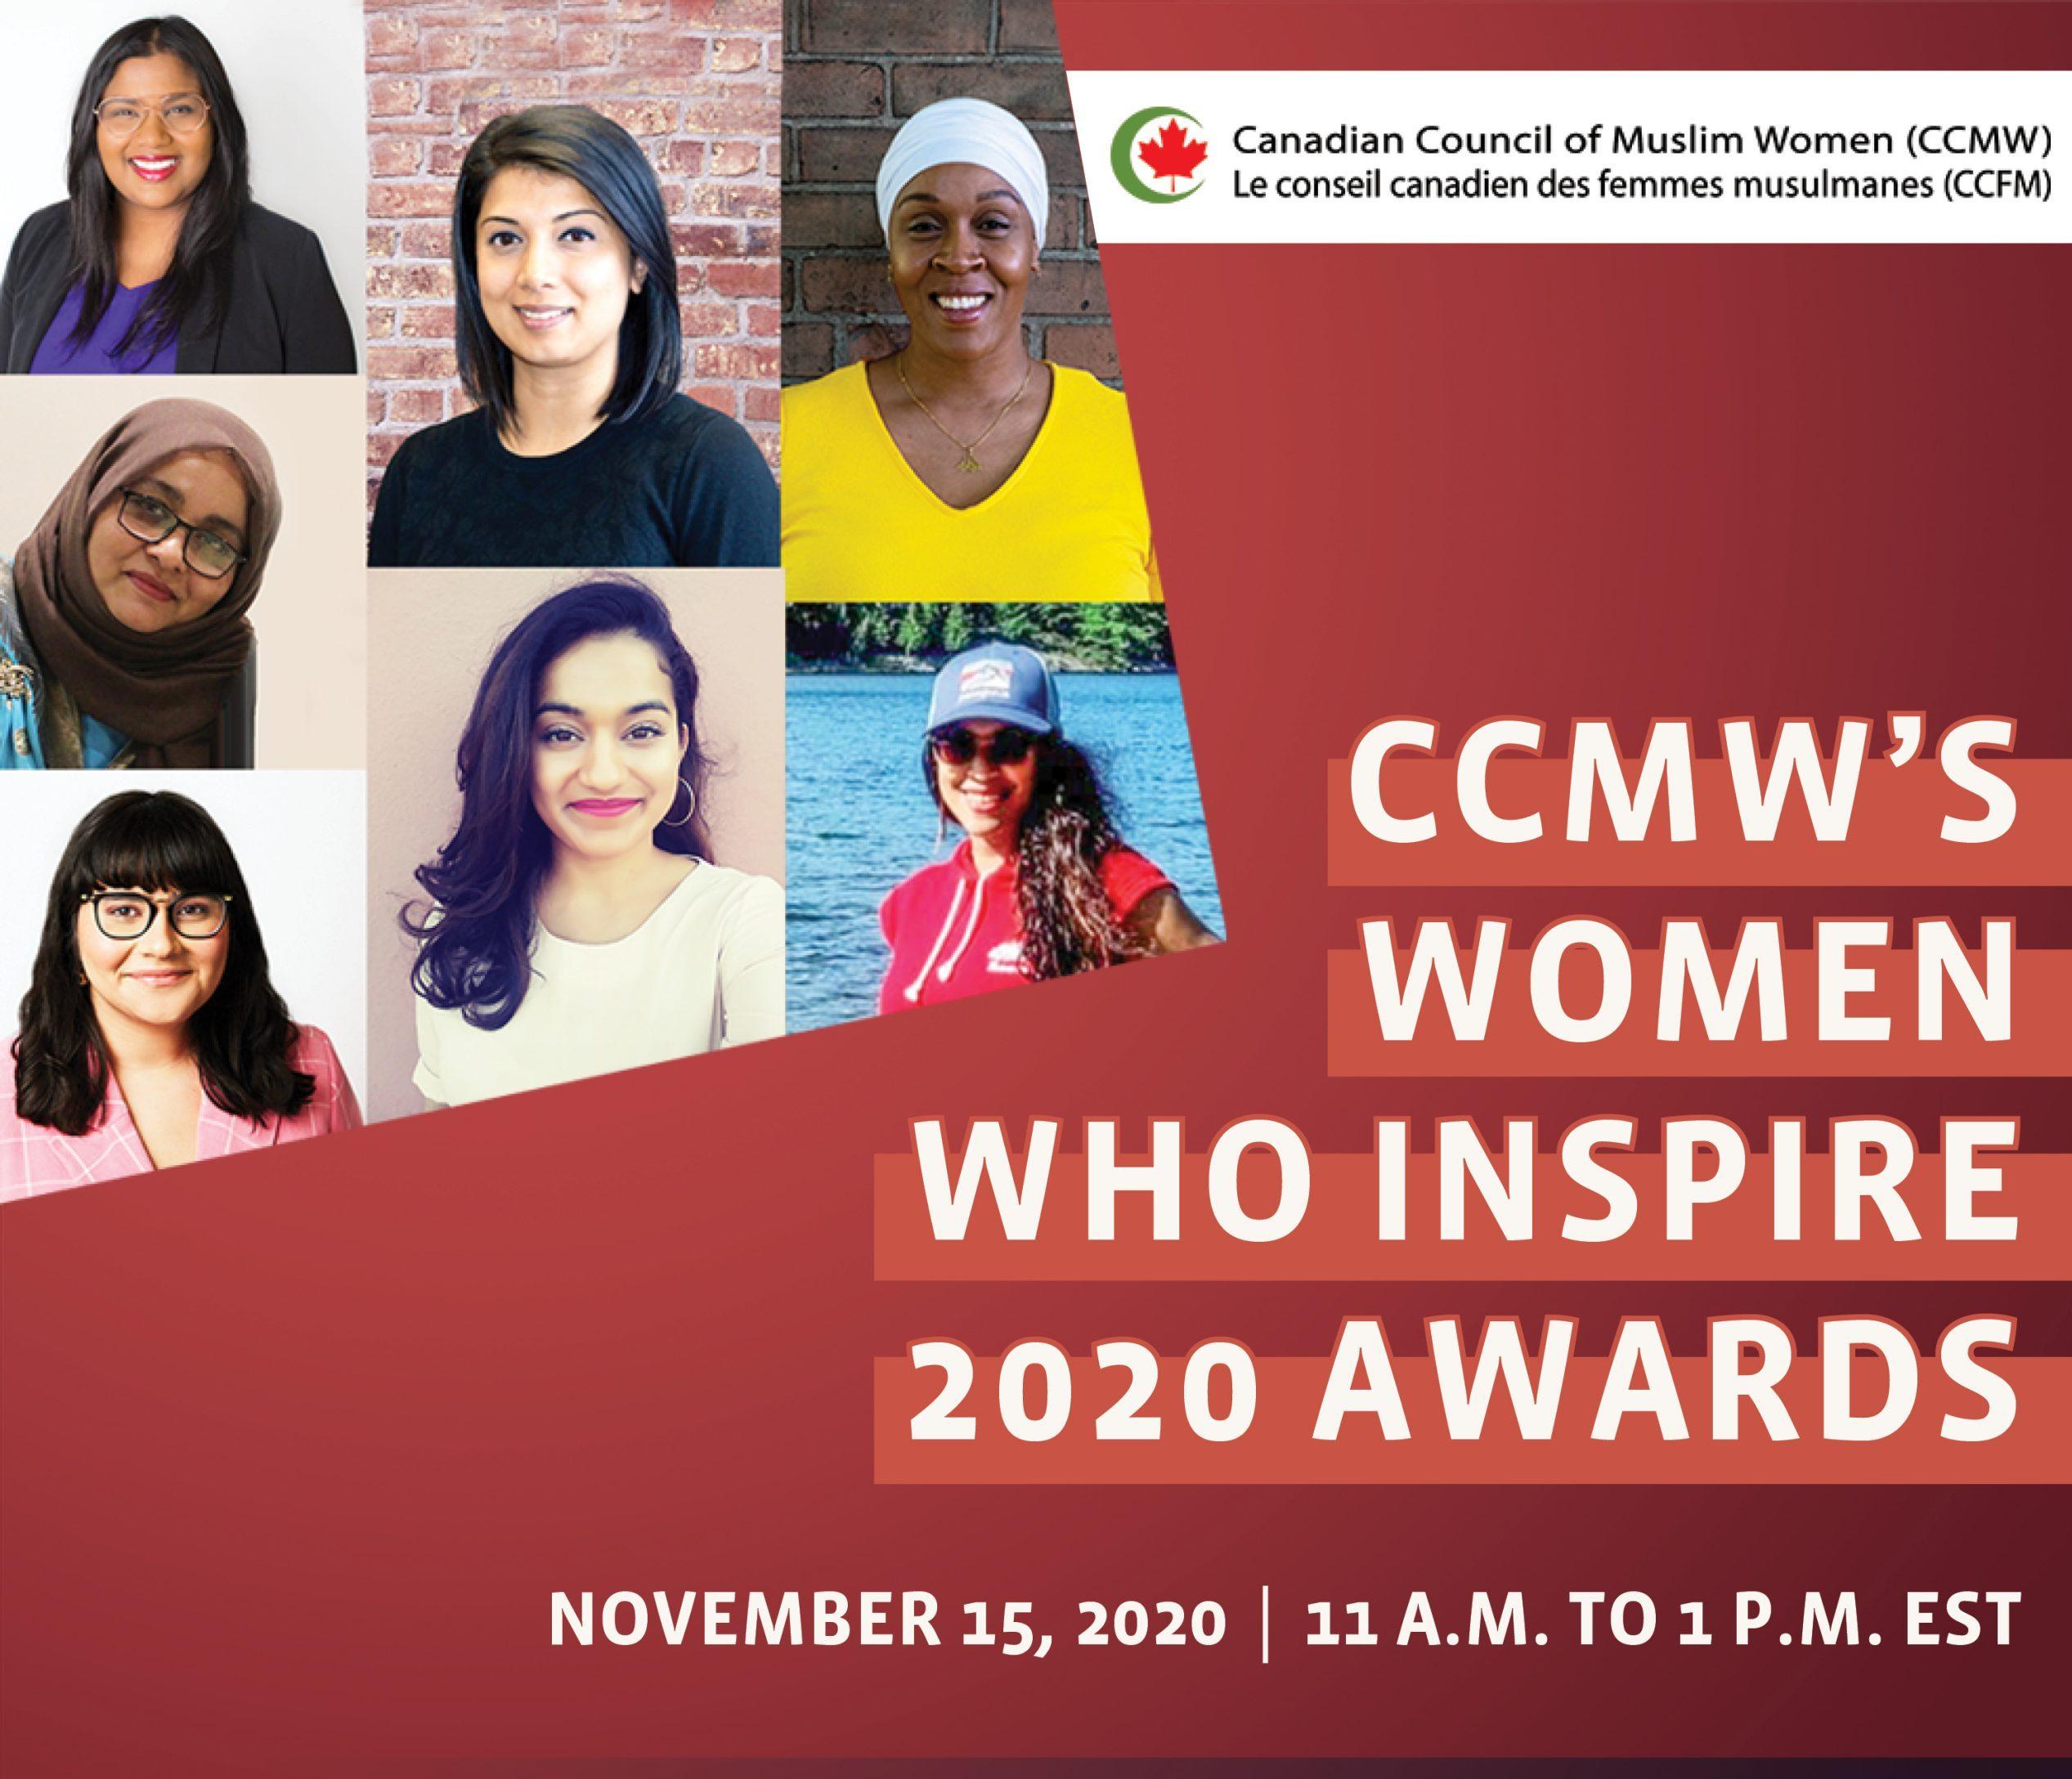 CCMW Women who inspire